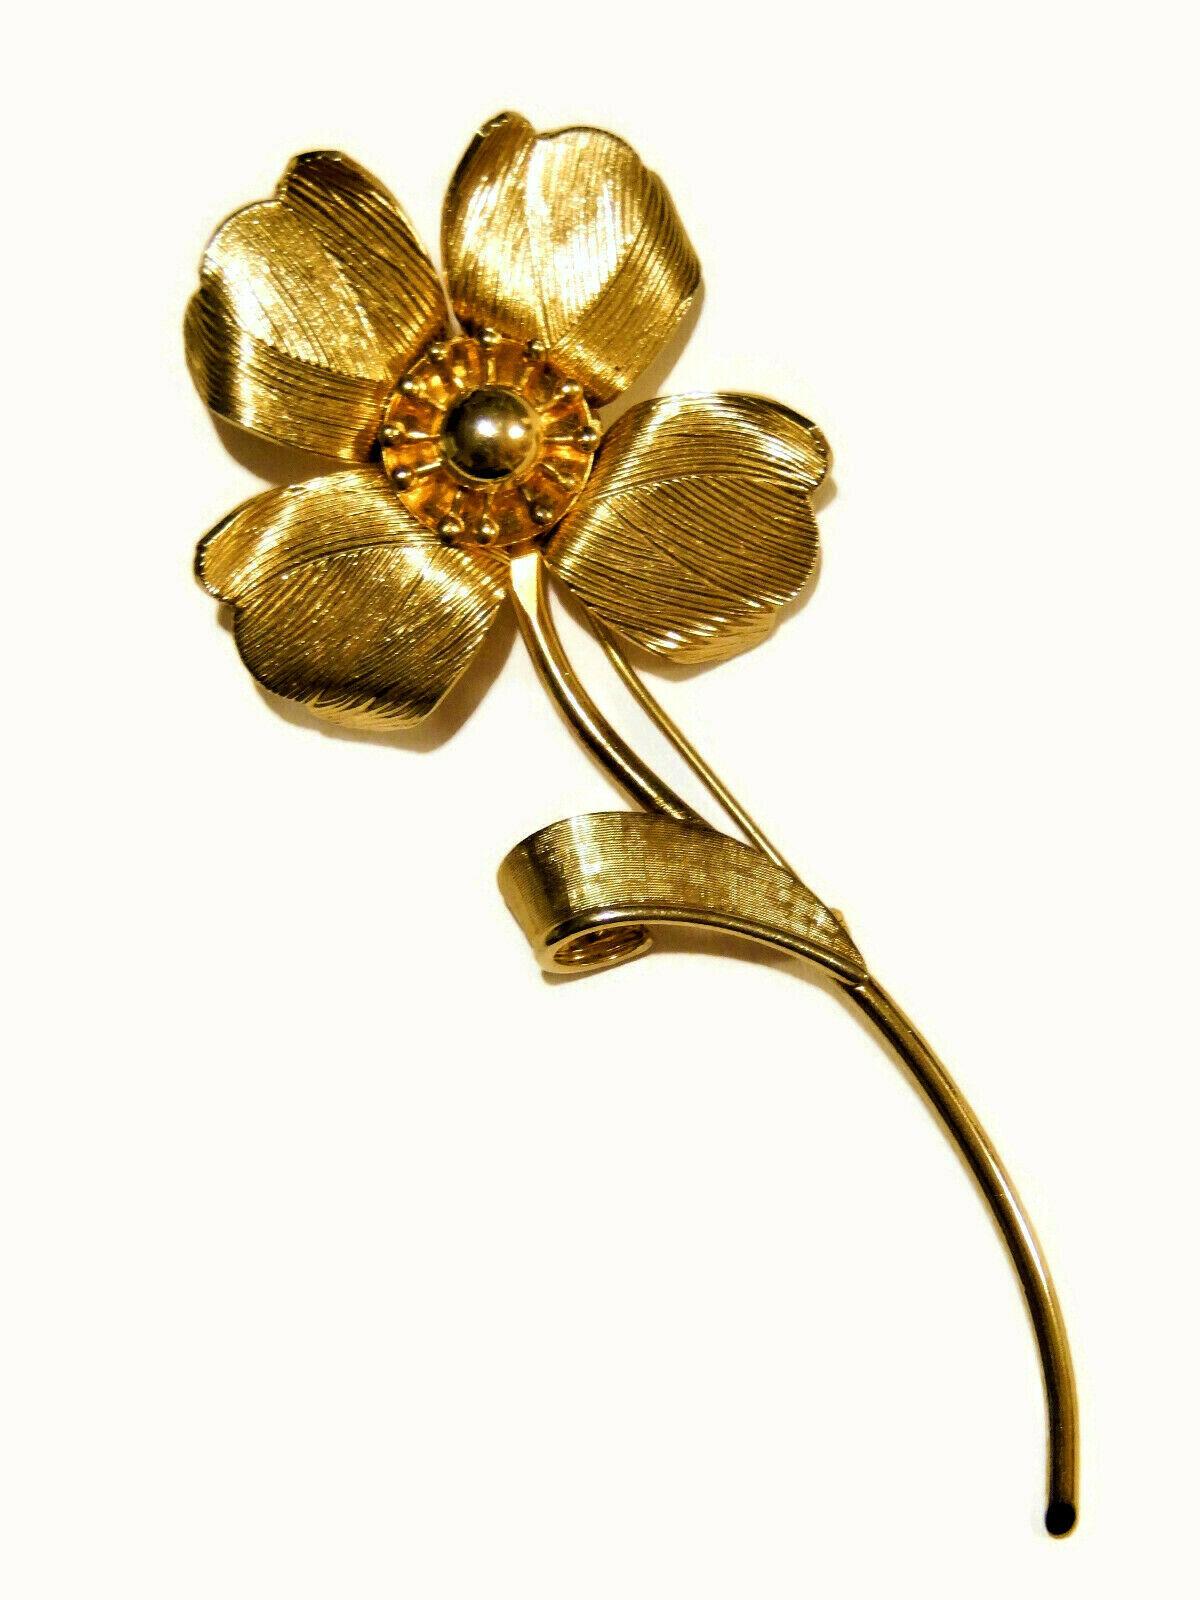 Vintage Coro flower long stem gold tone brooch pin jewelry  - $14.95